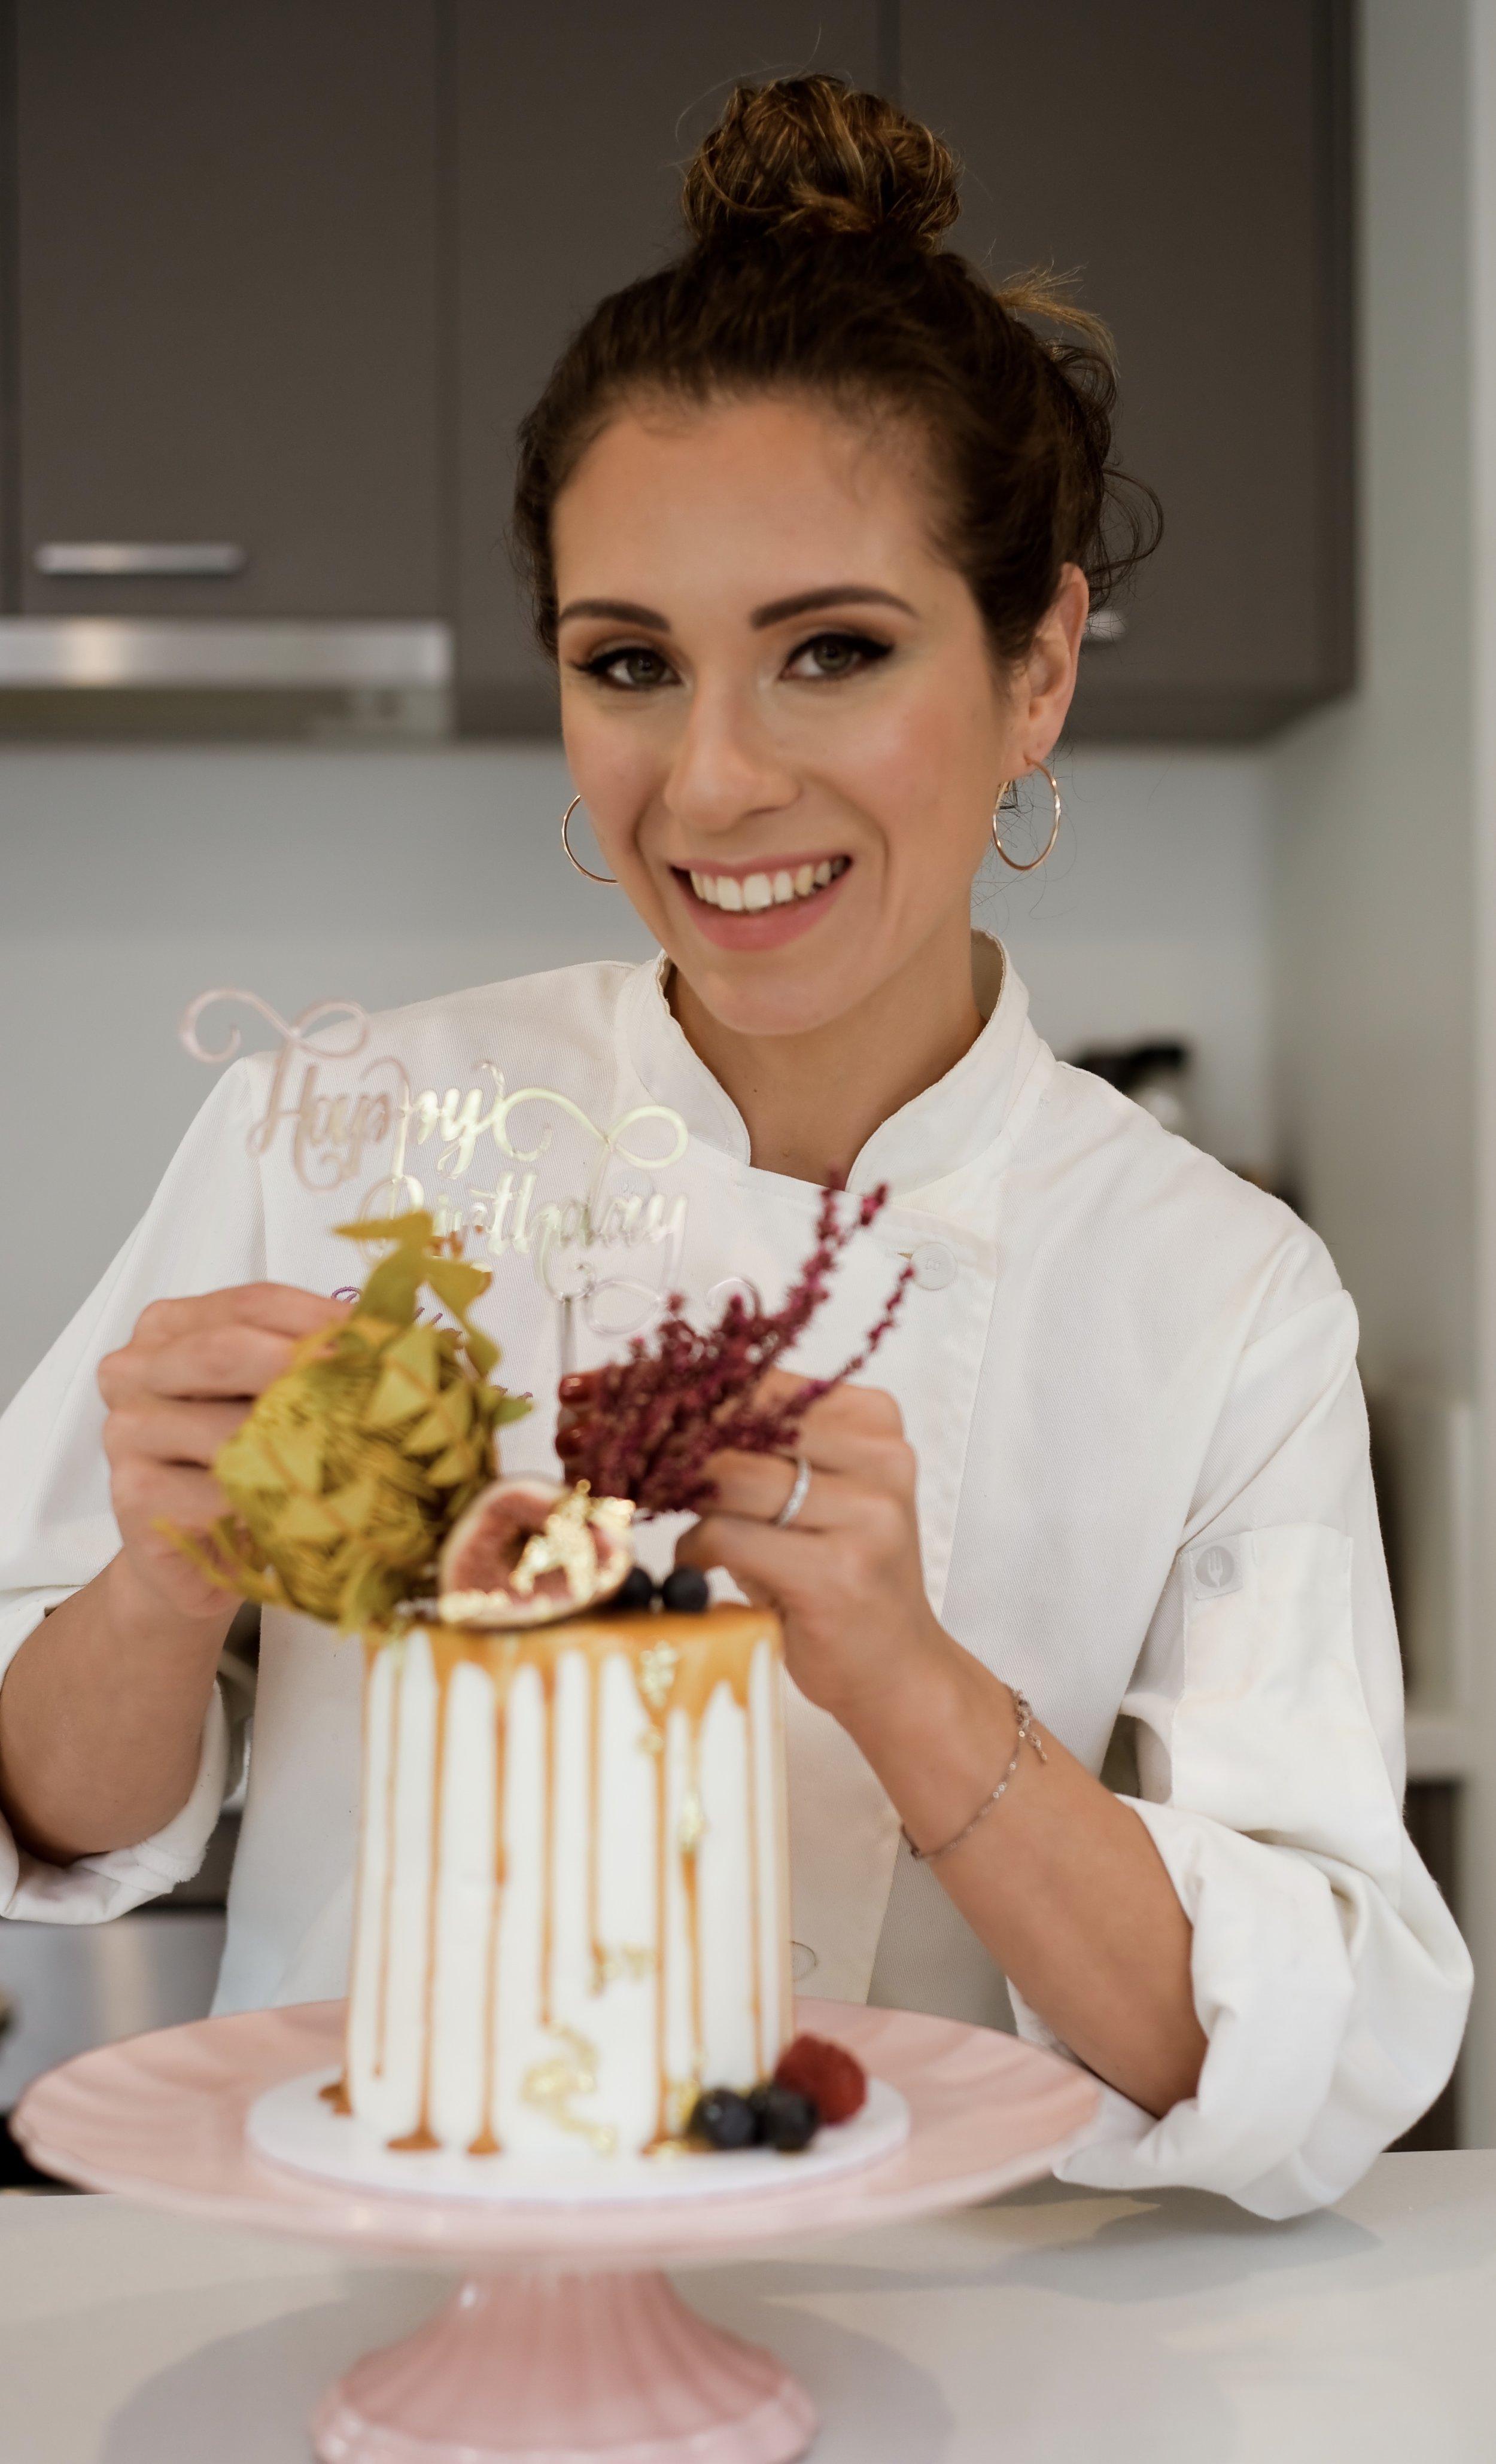 Paolla-Frias-Vegan-Pastry-Chef.jpg